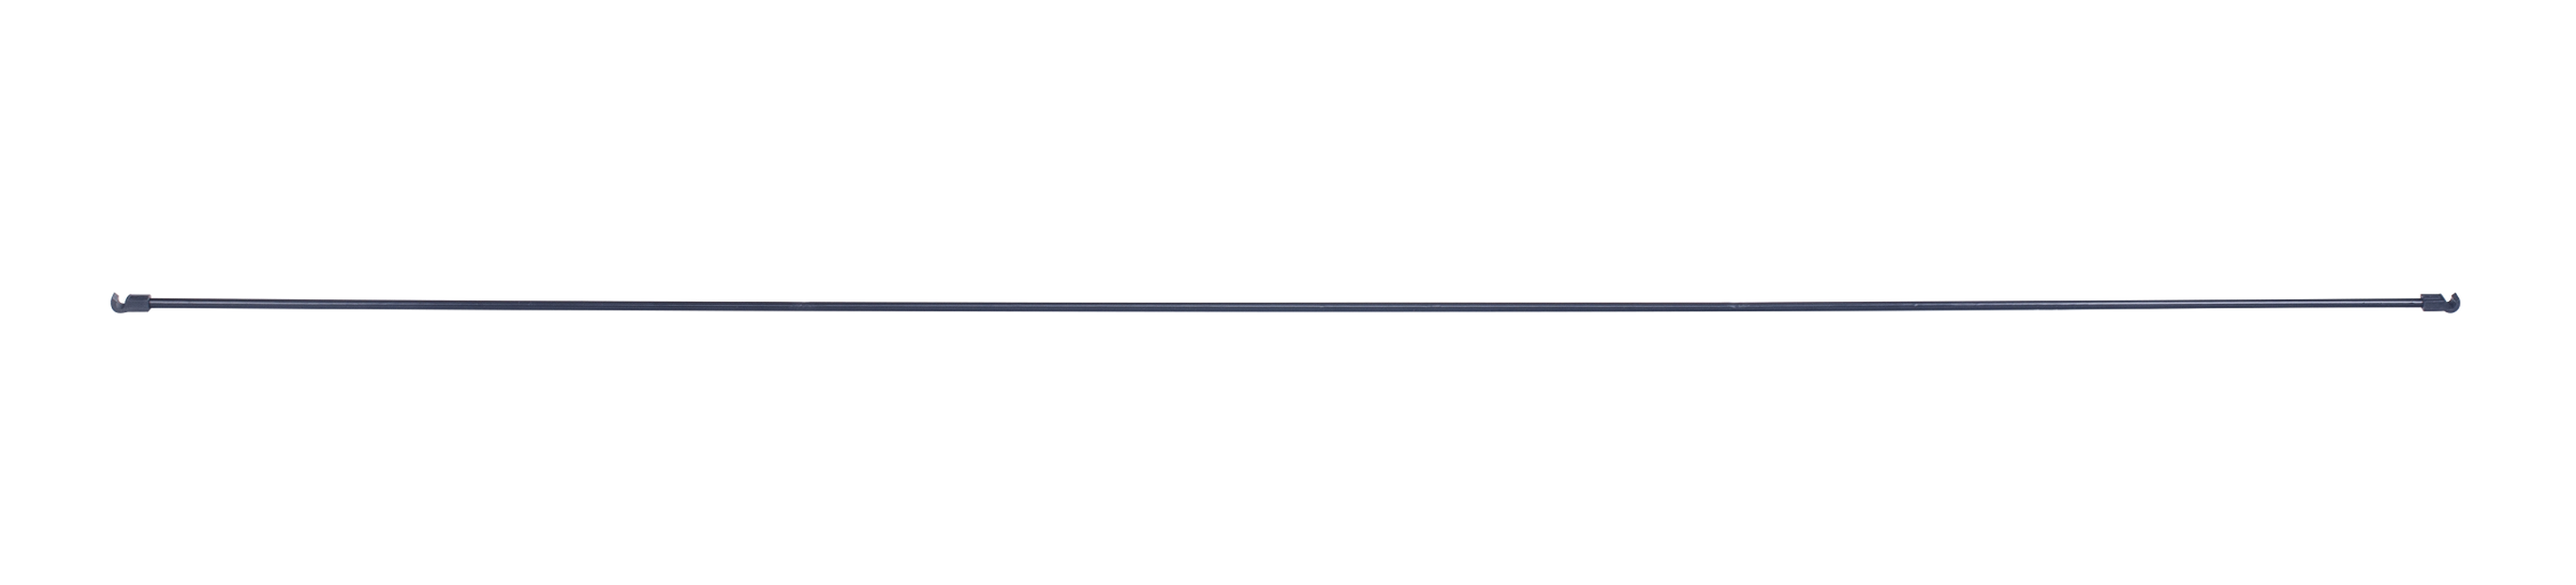 Kaarien metallituki, Pituus 117 cm, Musta